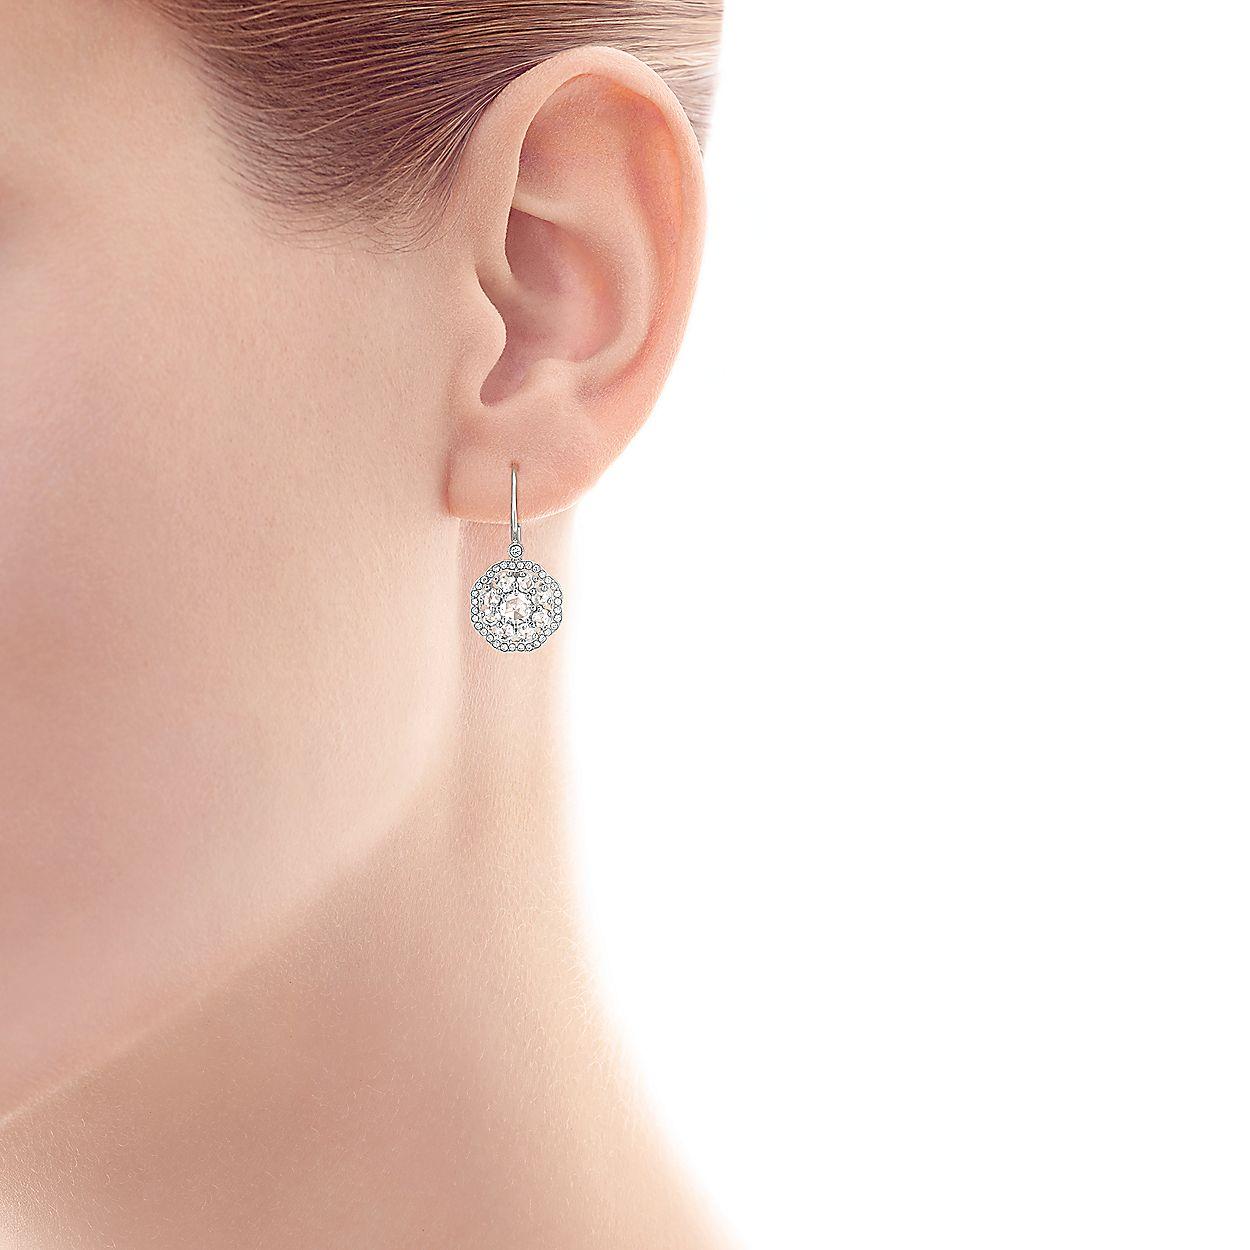 43c5f4298 Tiffany Enchant® fleur earrings in platinum with diamonds, mini ...